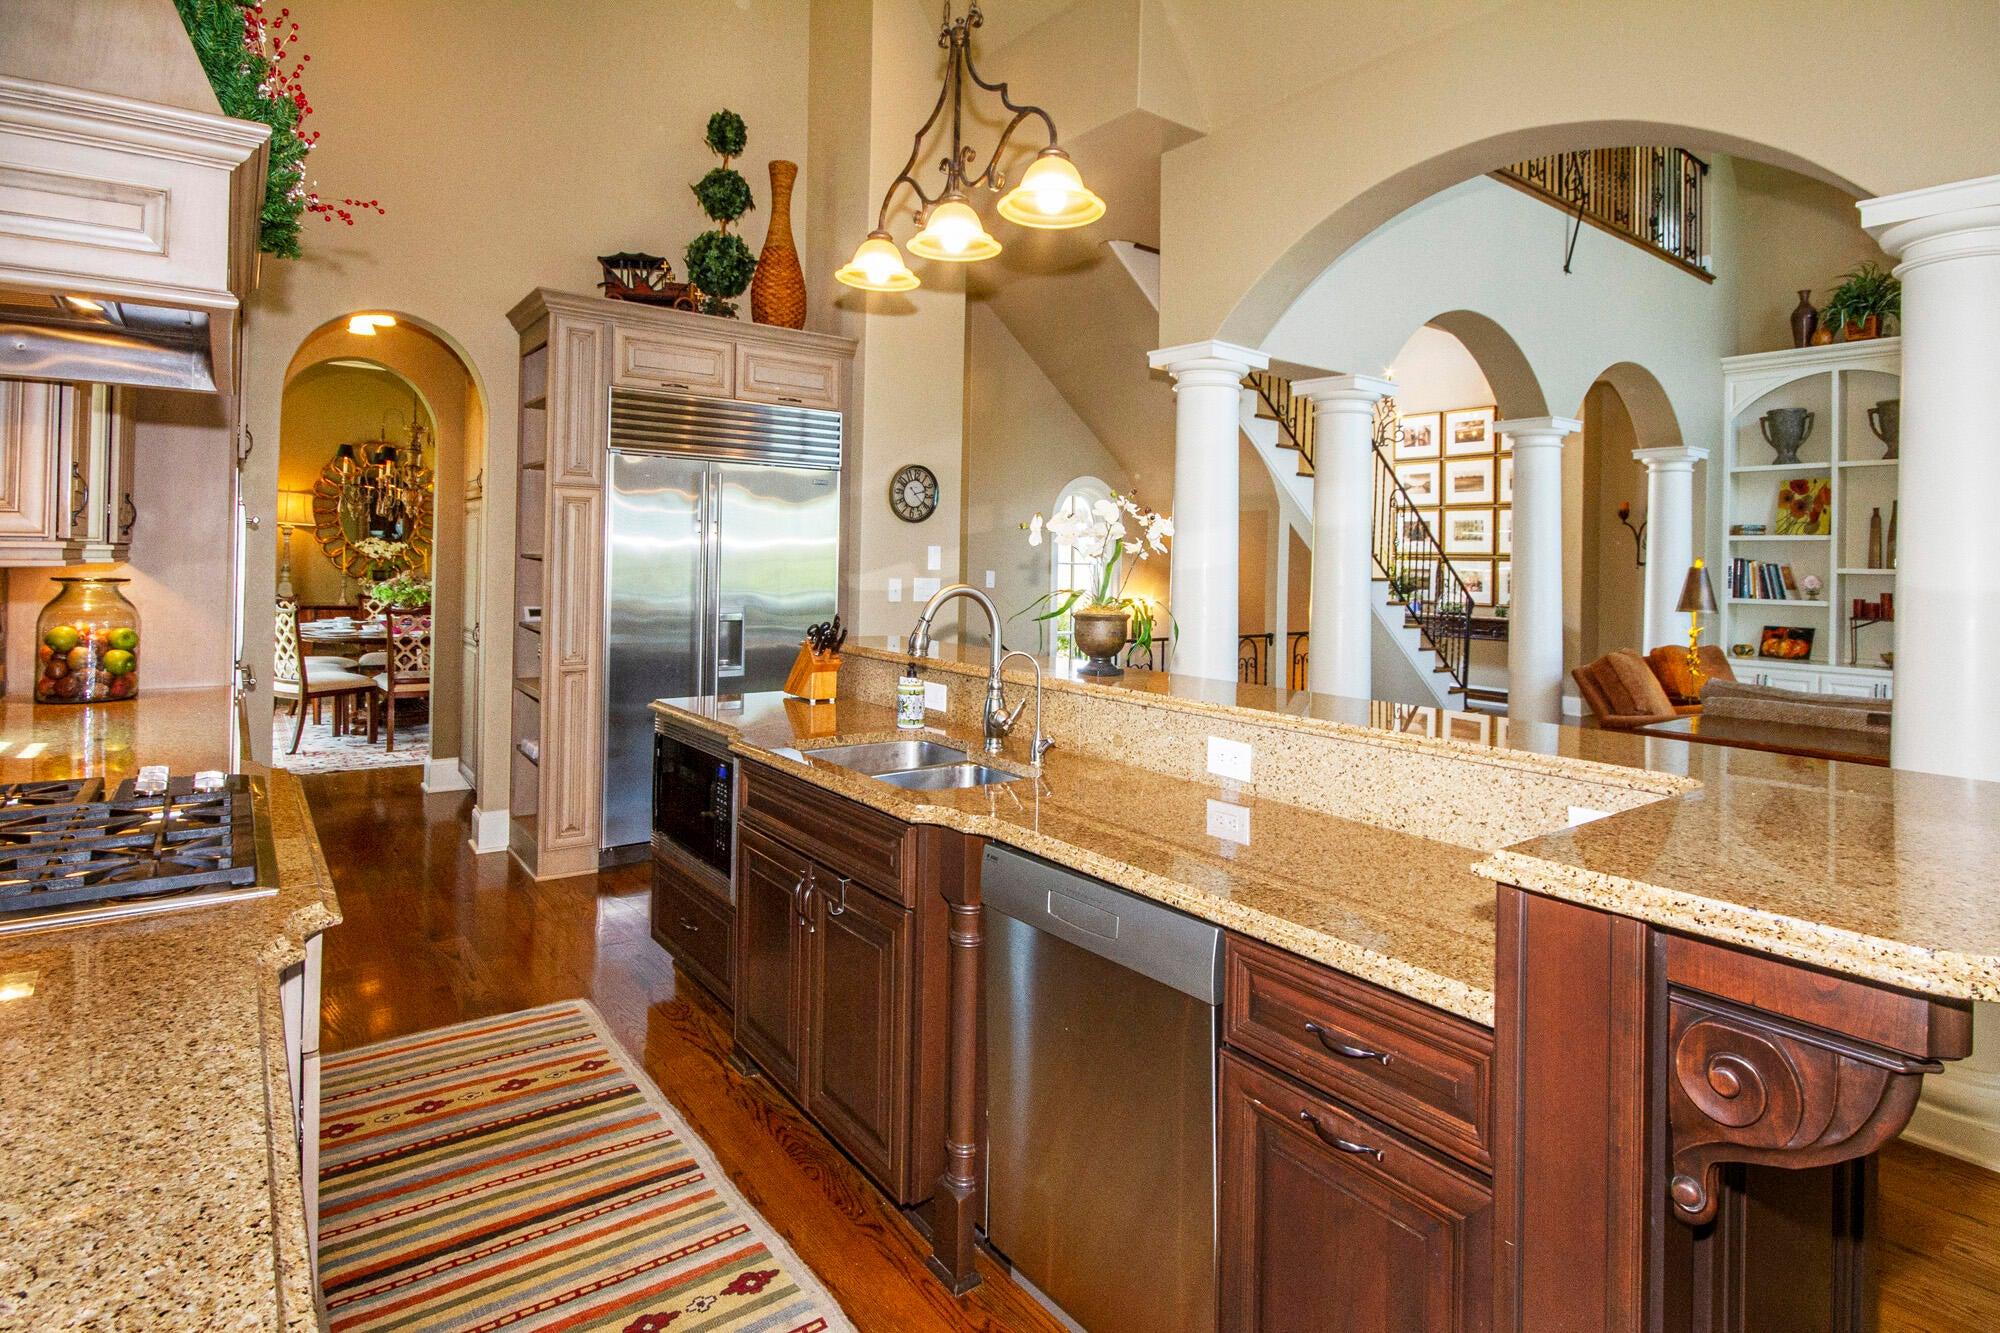 Sub-Zero Fridge & Cookbook Shelf!